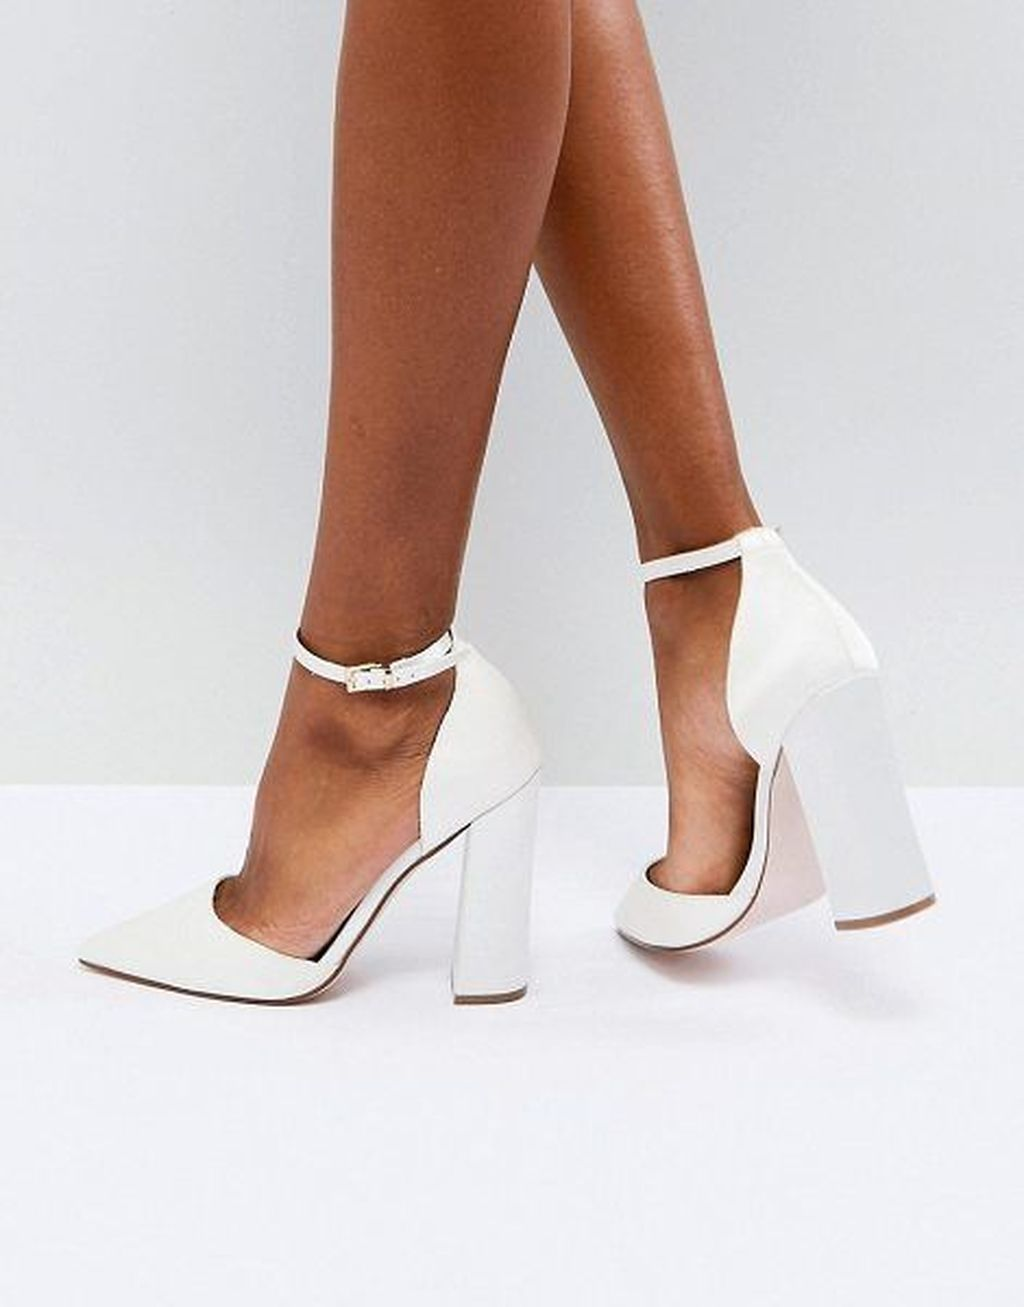 Pin By Antonia Mousouraki On Wedding Shoes Wedding Shoes Heels Best Bridal Shoes Bridal Shoes